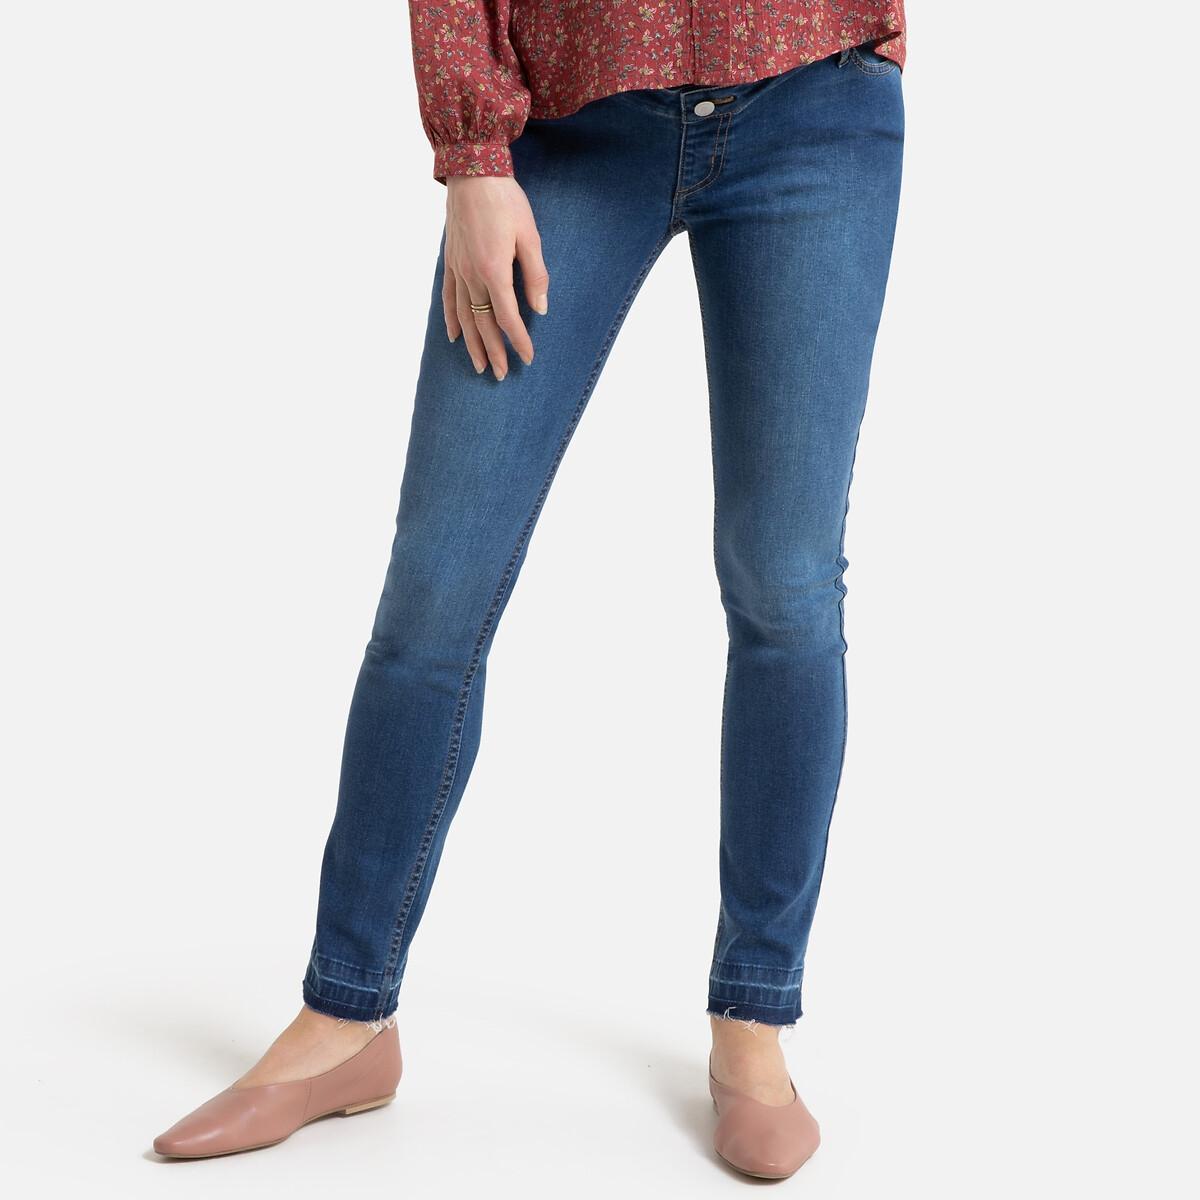 Картинки узких джинс